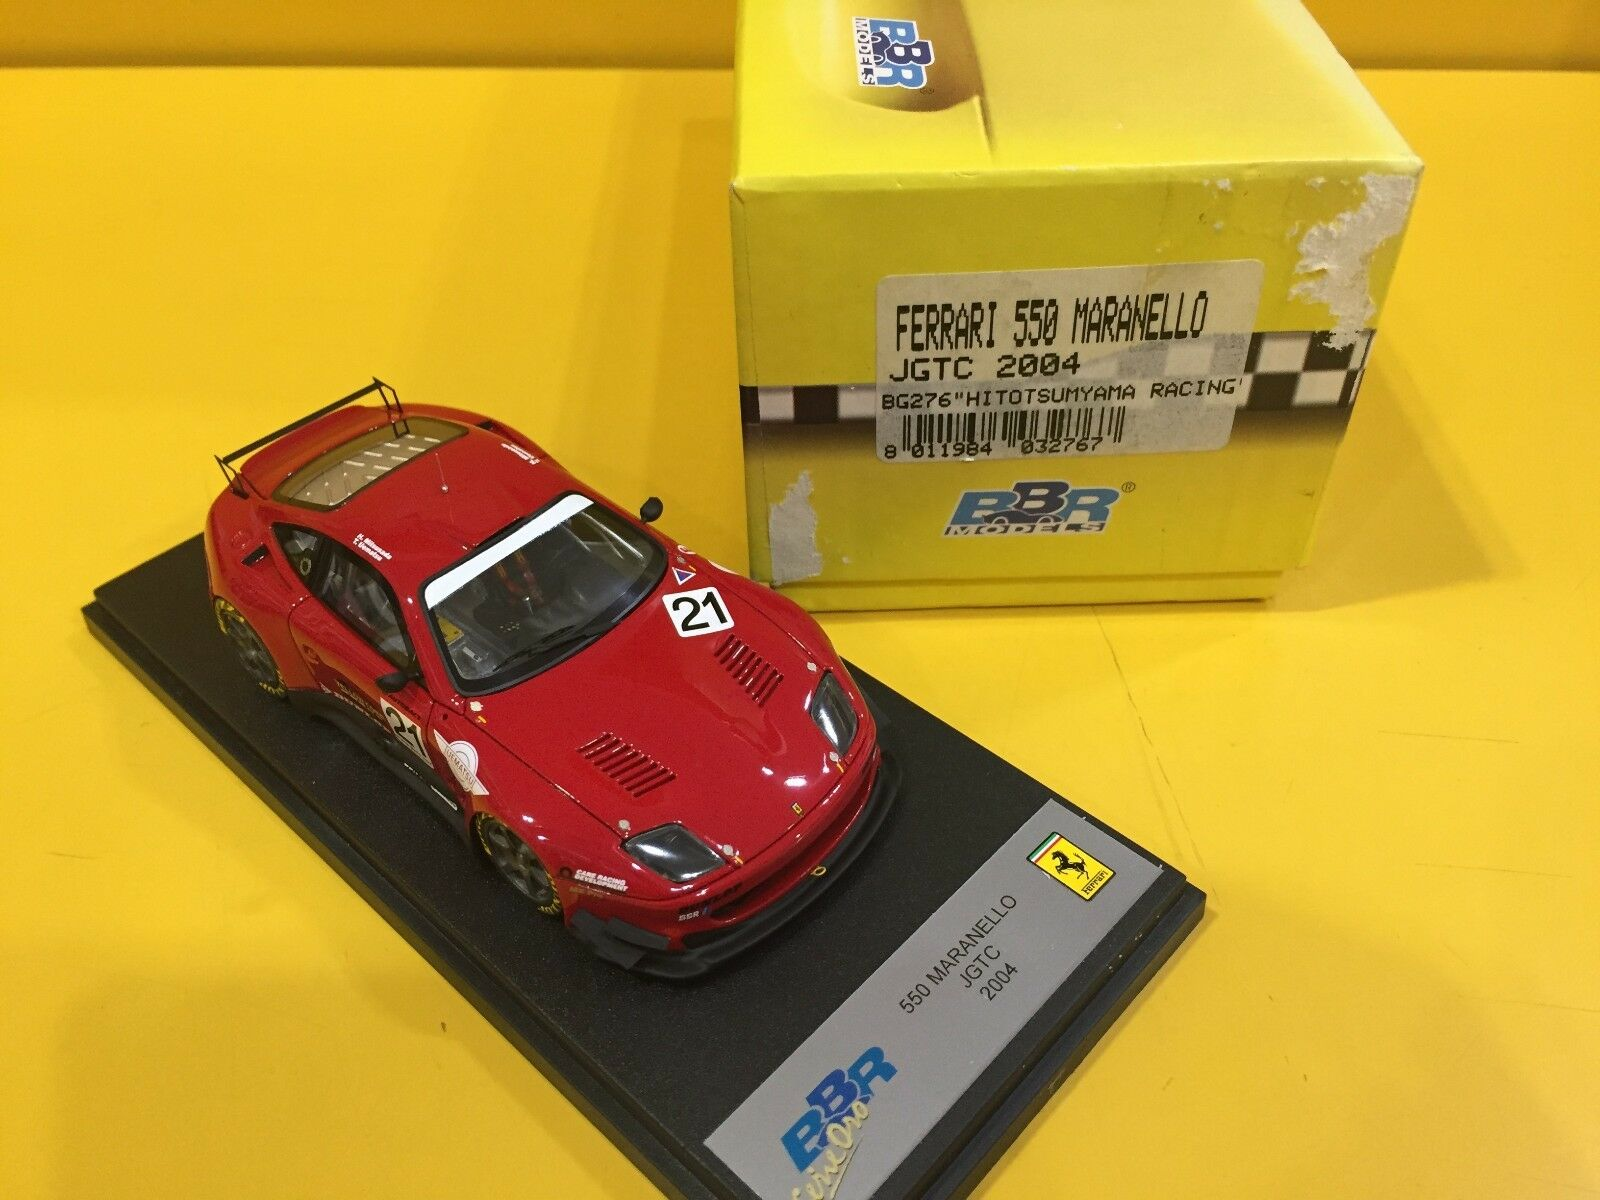 BBR MODELS BG276 - Ferrari  Maranello JGTC 2018